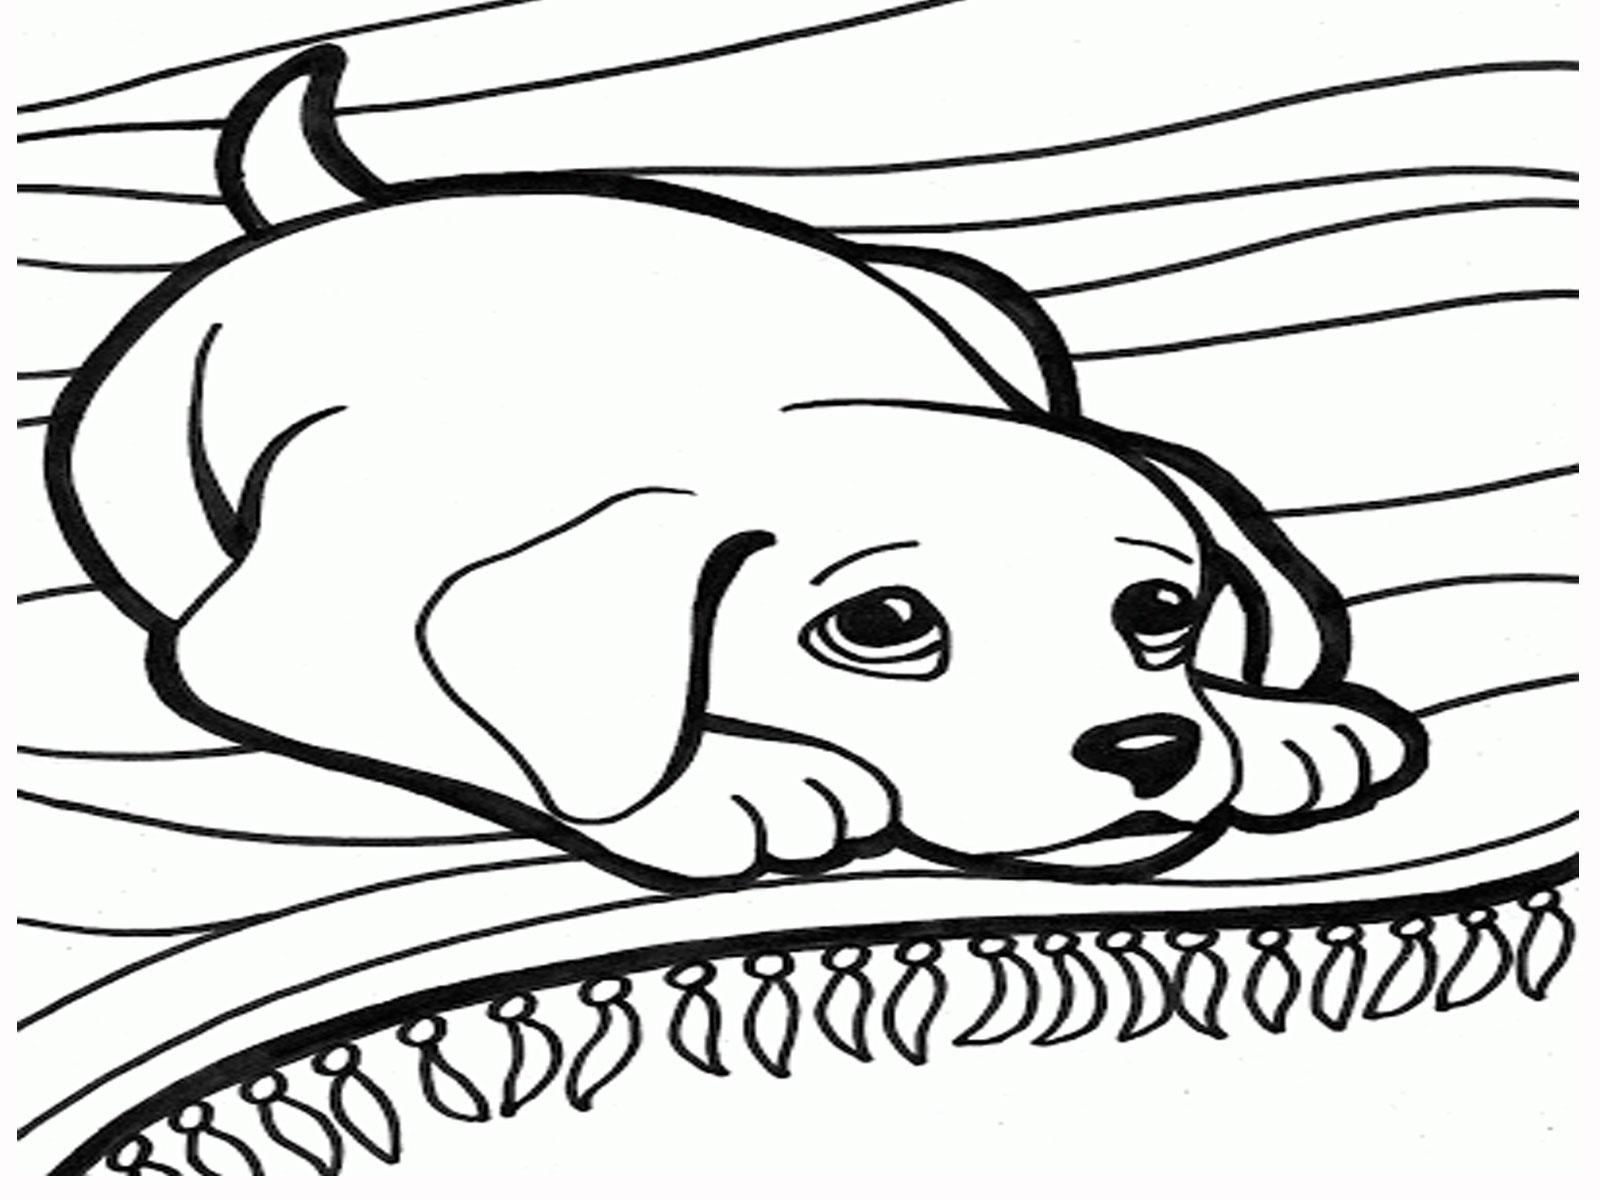 Impressive Dog Colouring In Wonderful Free Coloring Pages Of Dogs - Colouring Pages Dogs Free Printable